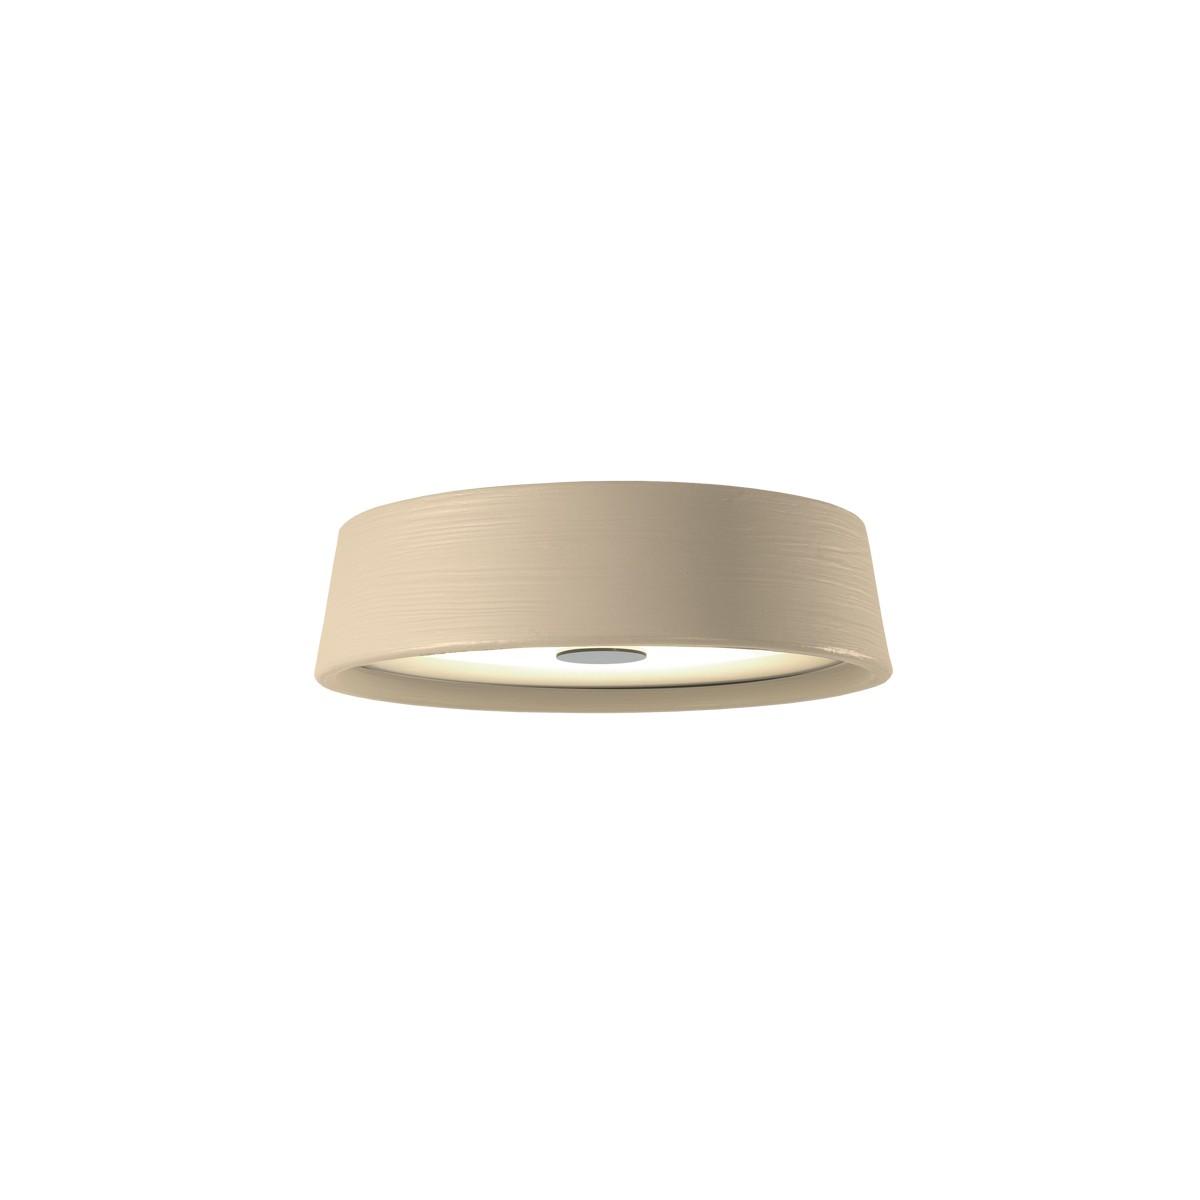 Marset Soho C 38 LED Deckenleuchte, sandfarben